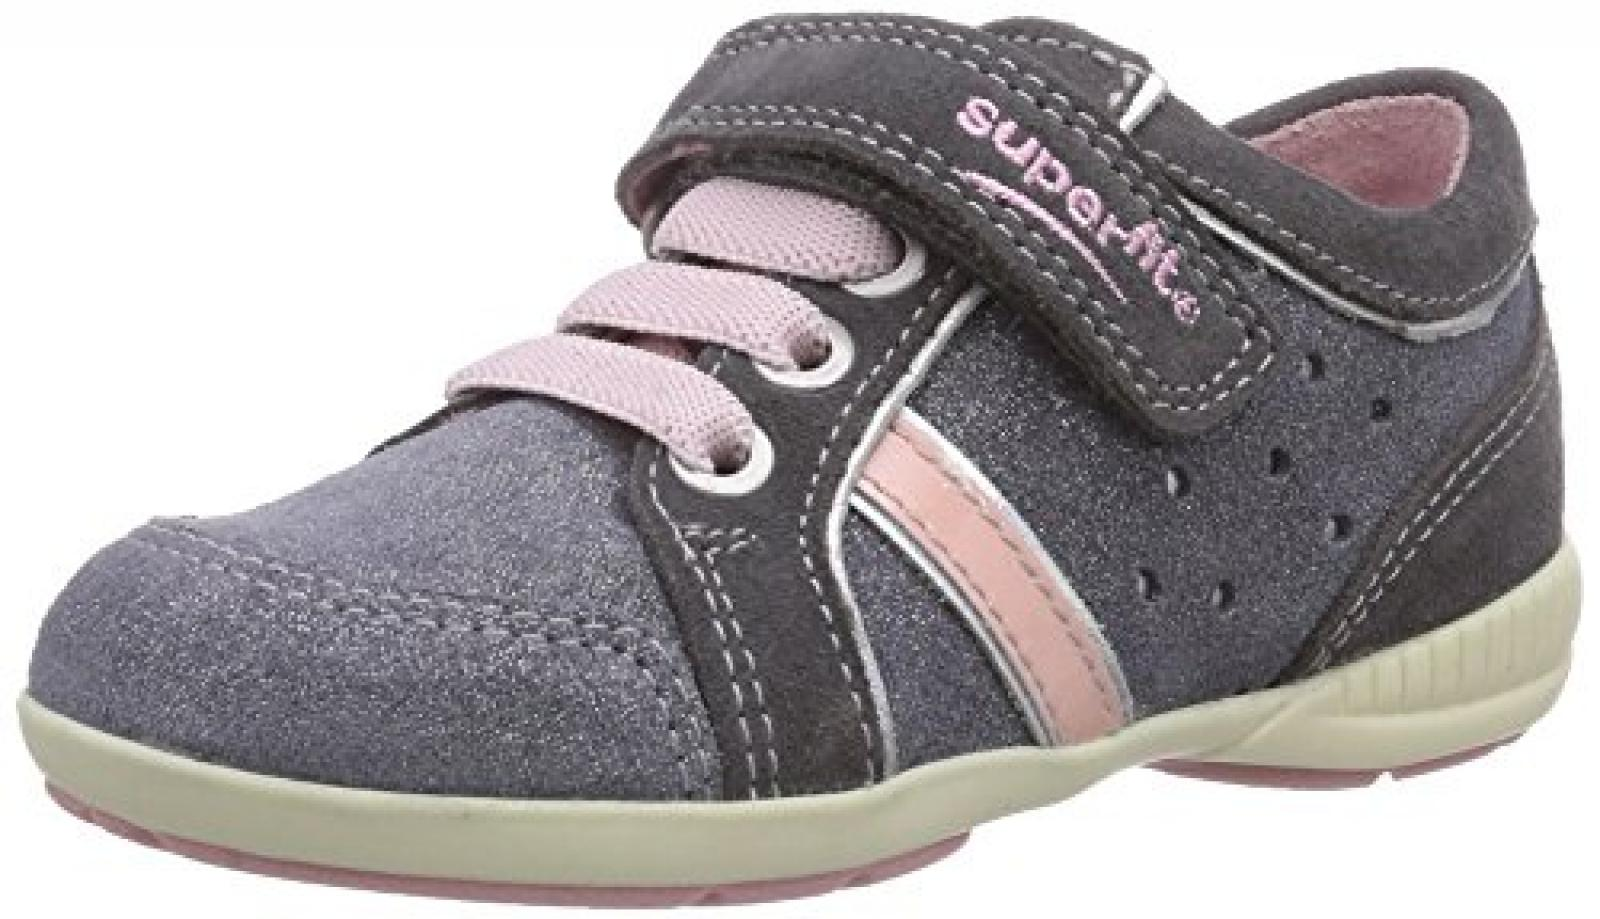 Superfit NELE Mädchen Sneakers